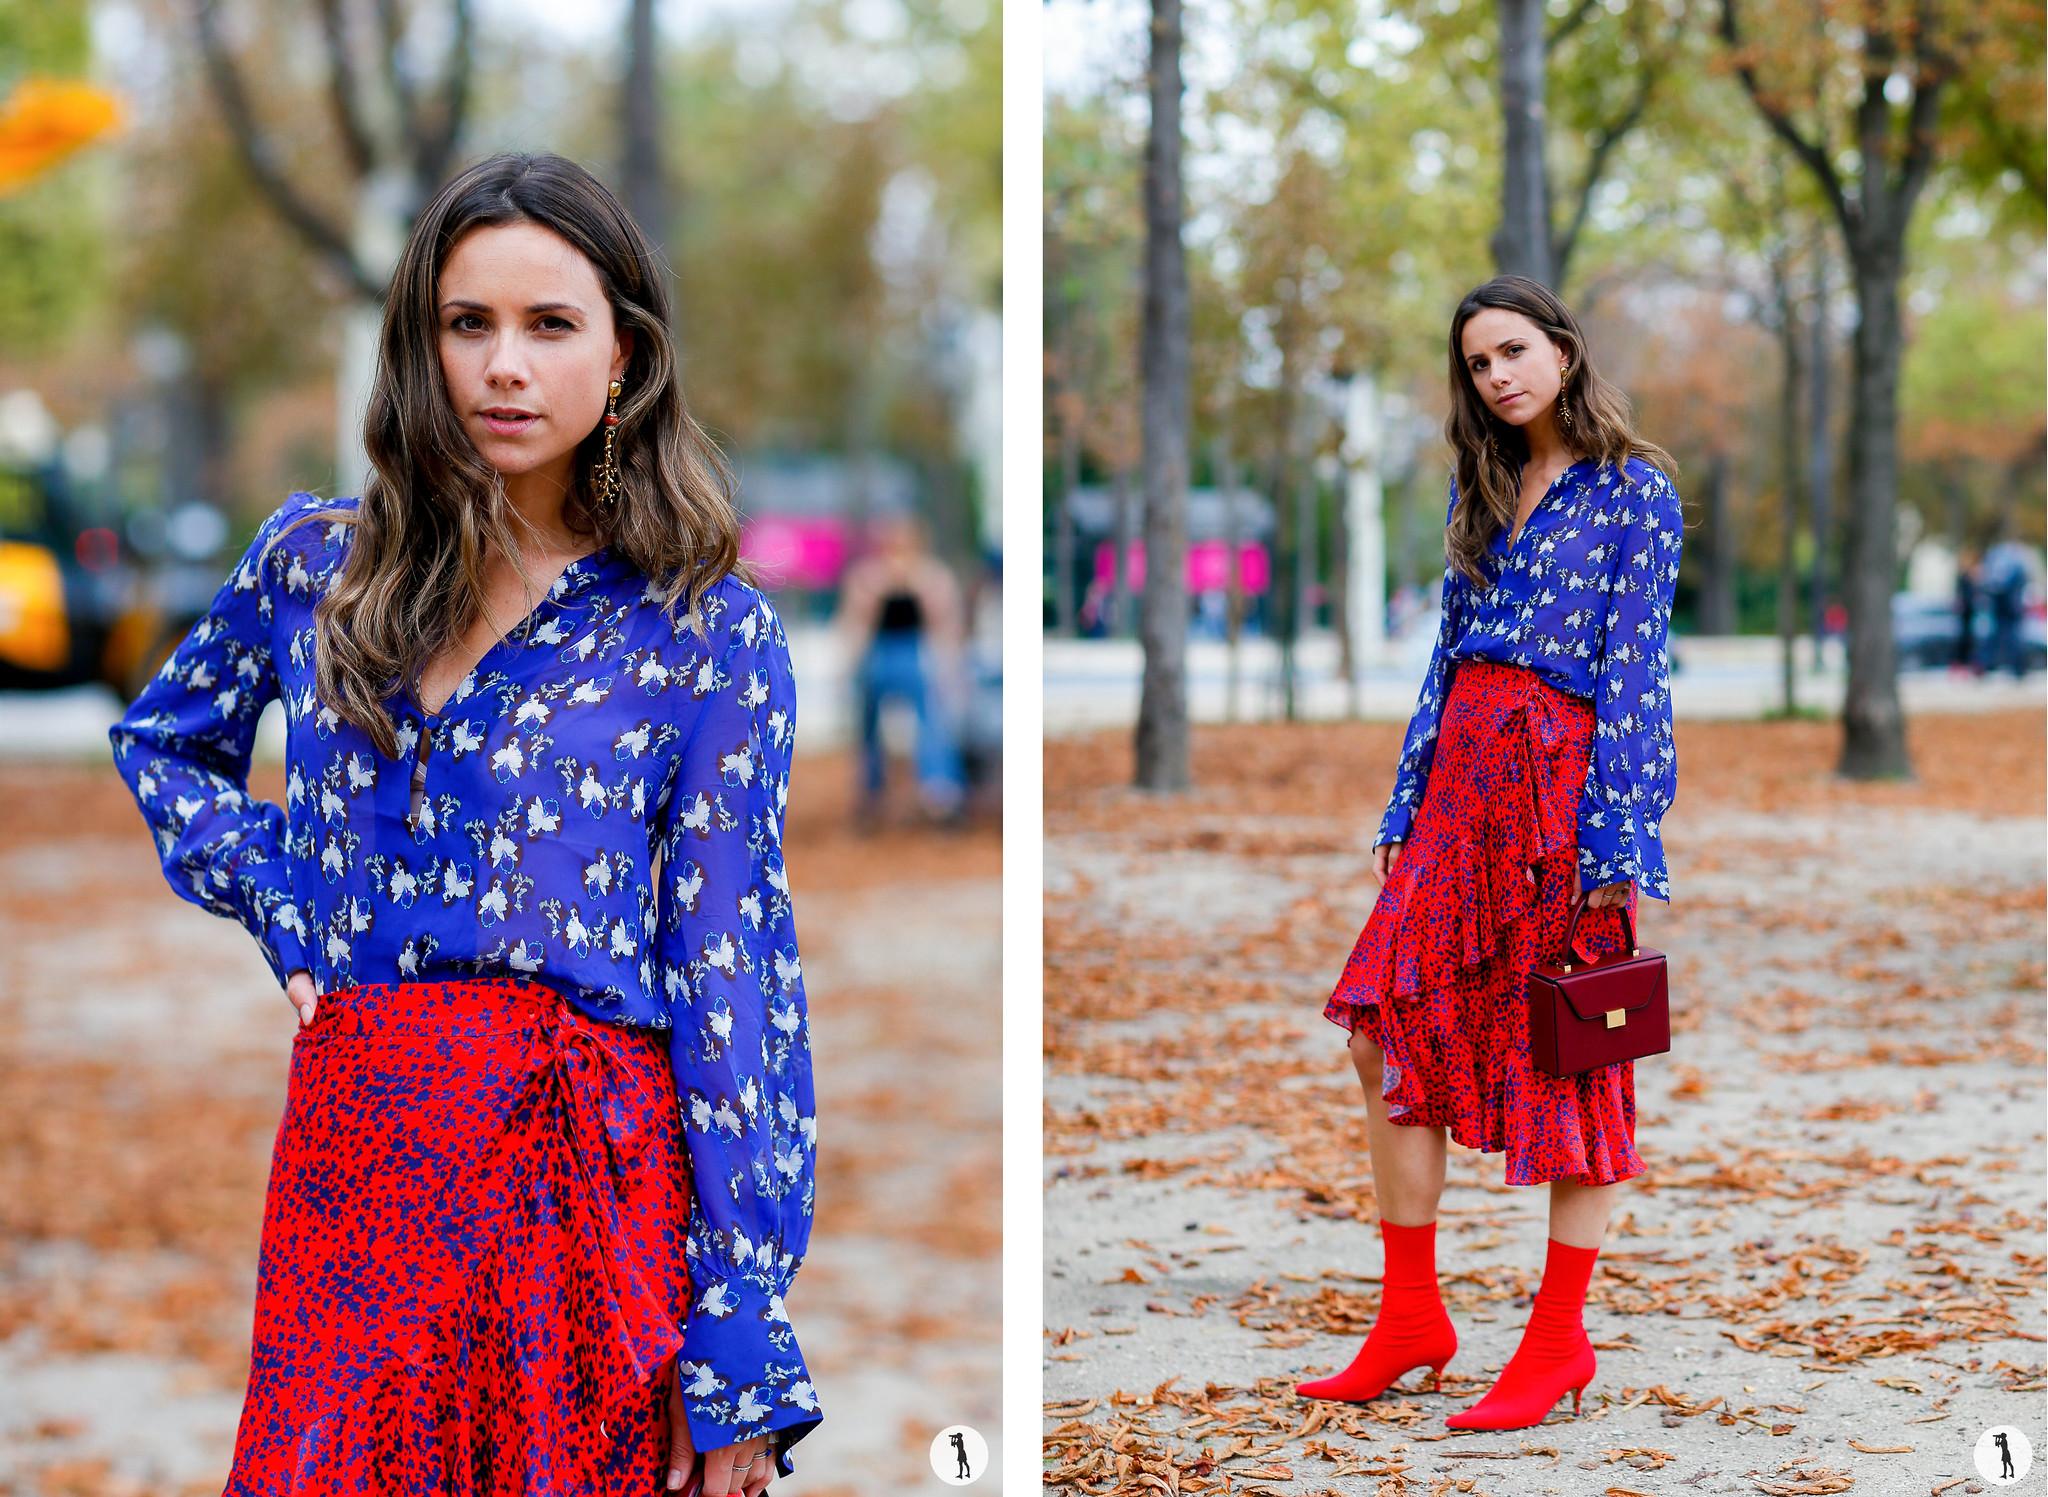 Florrie Thomas - Paris Fashion Week SS18